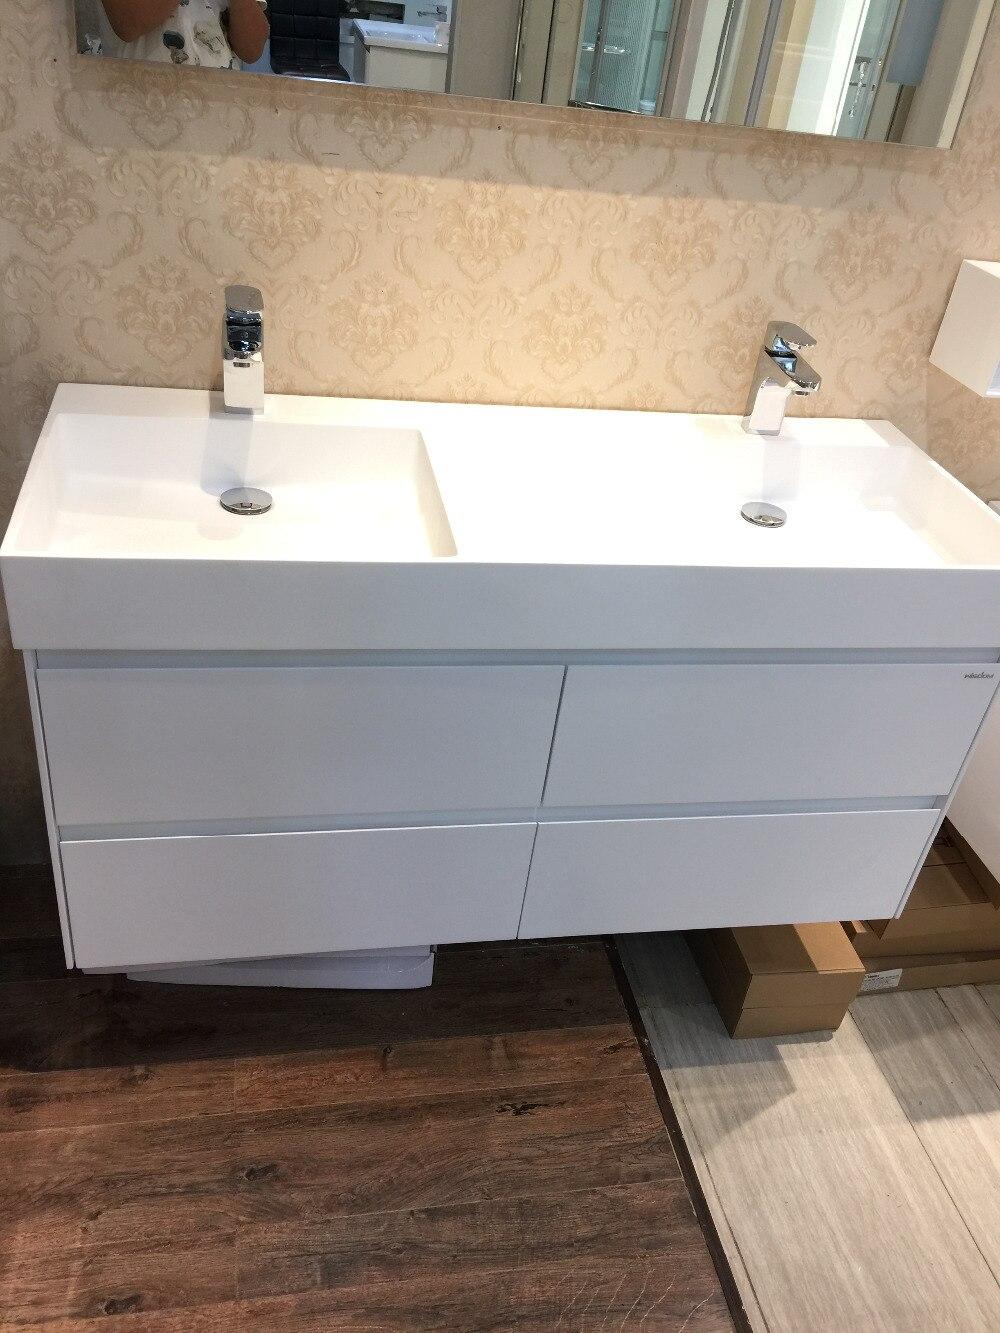 Bathroom washbasin cabinets - 1200mm Wall Mounted Solid Surface Stone Double Basin With Soild Wooden Bathroom Vanity Cloakroom Cabinet Oka